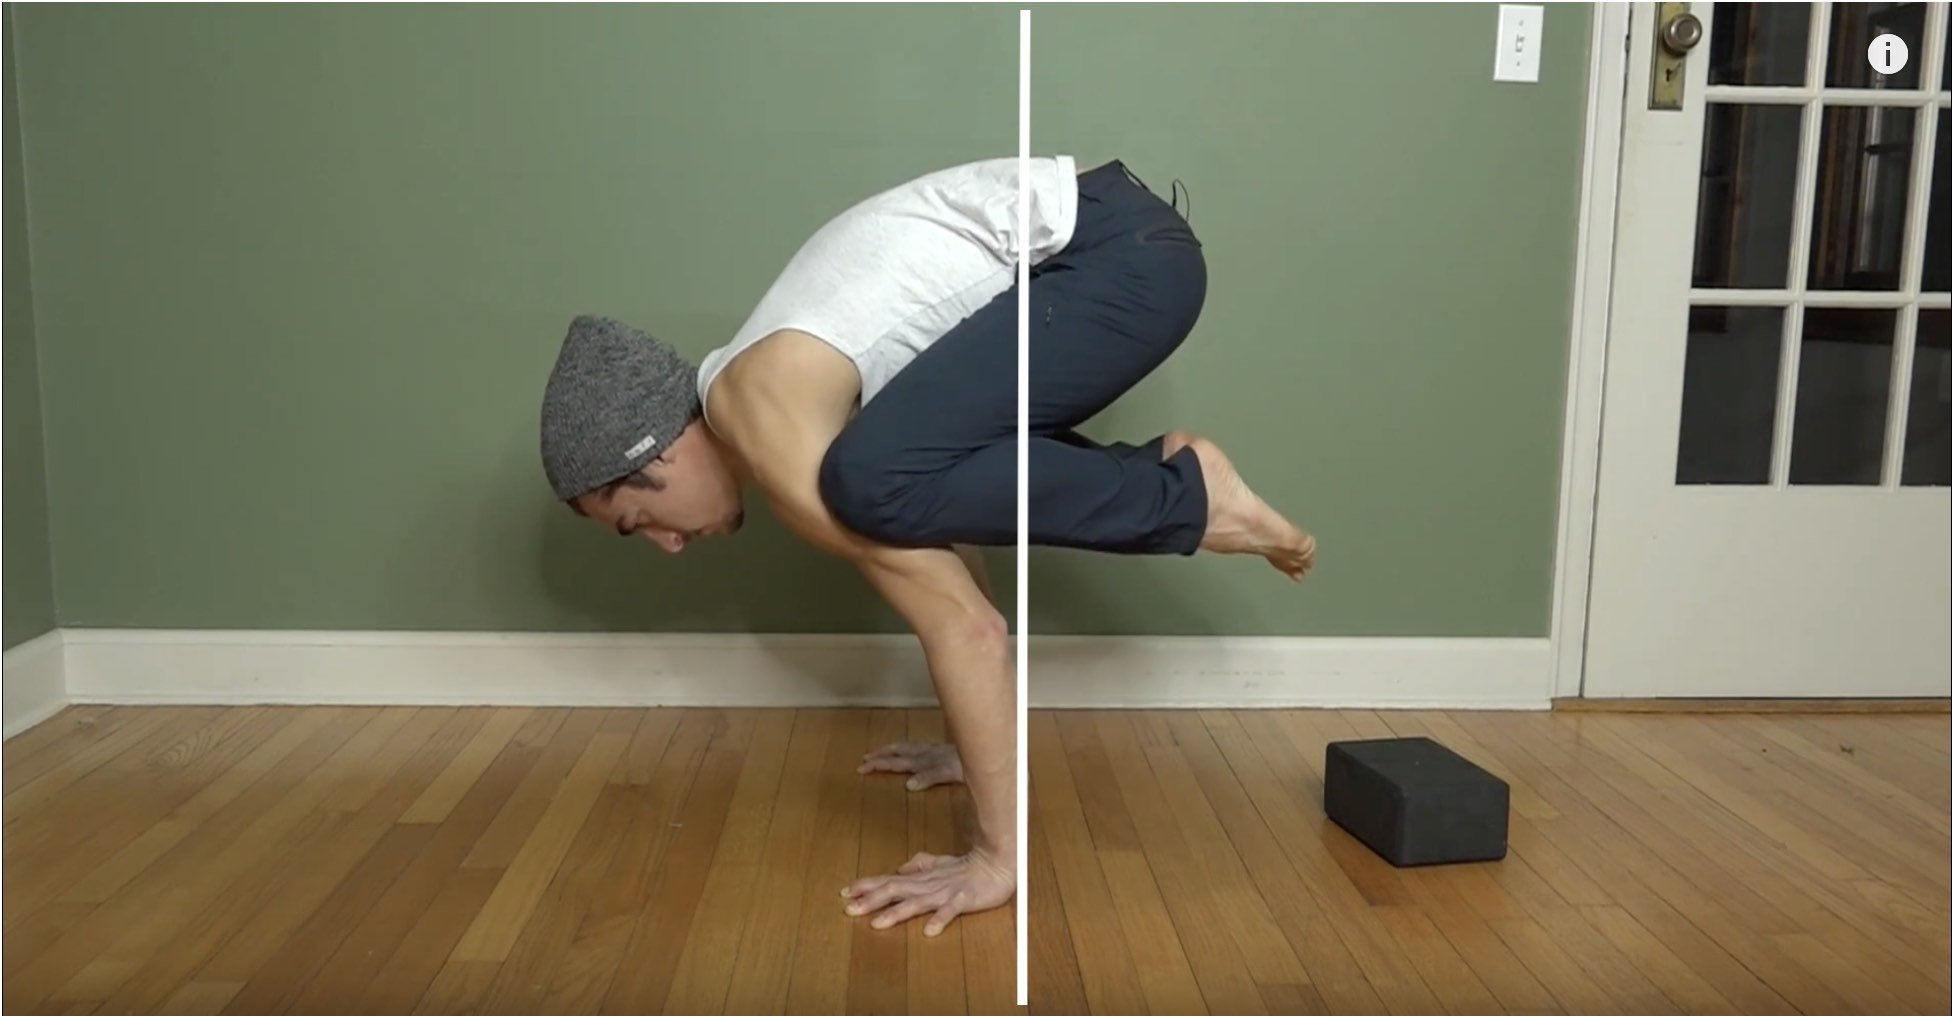 crow pose wrist strength and balance